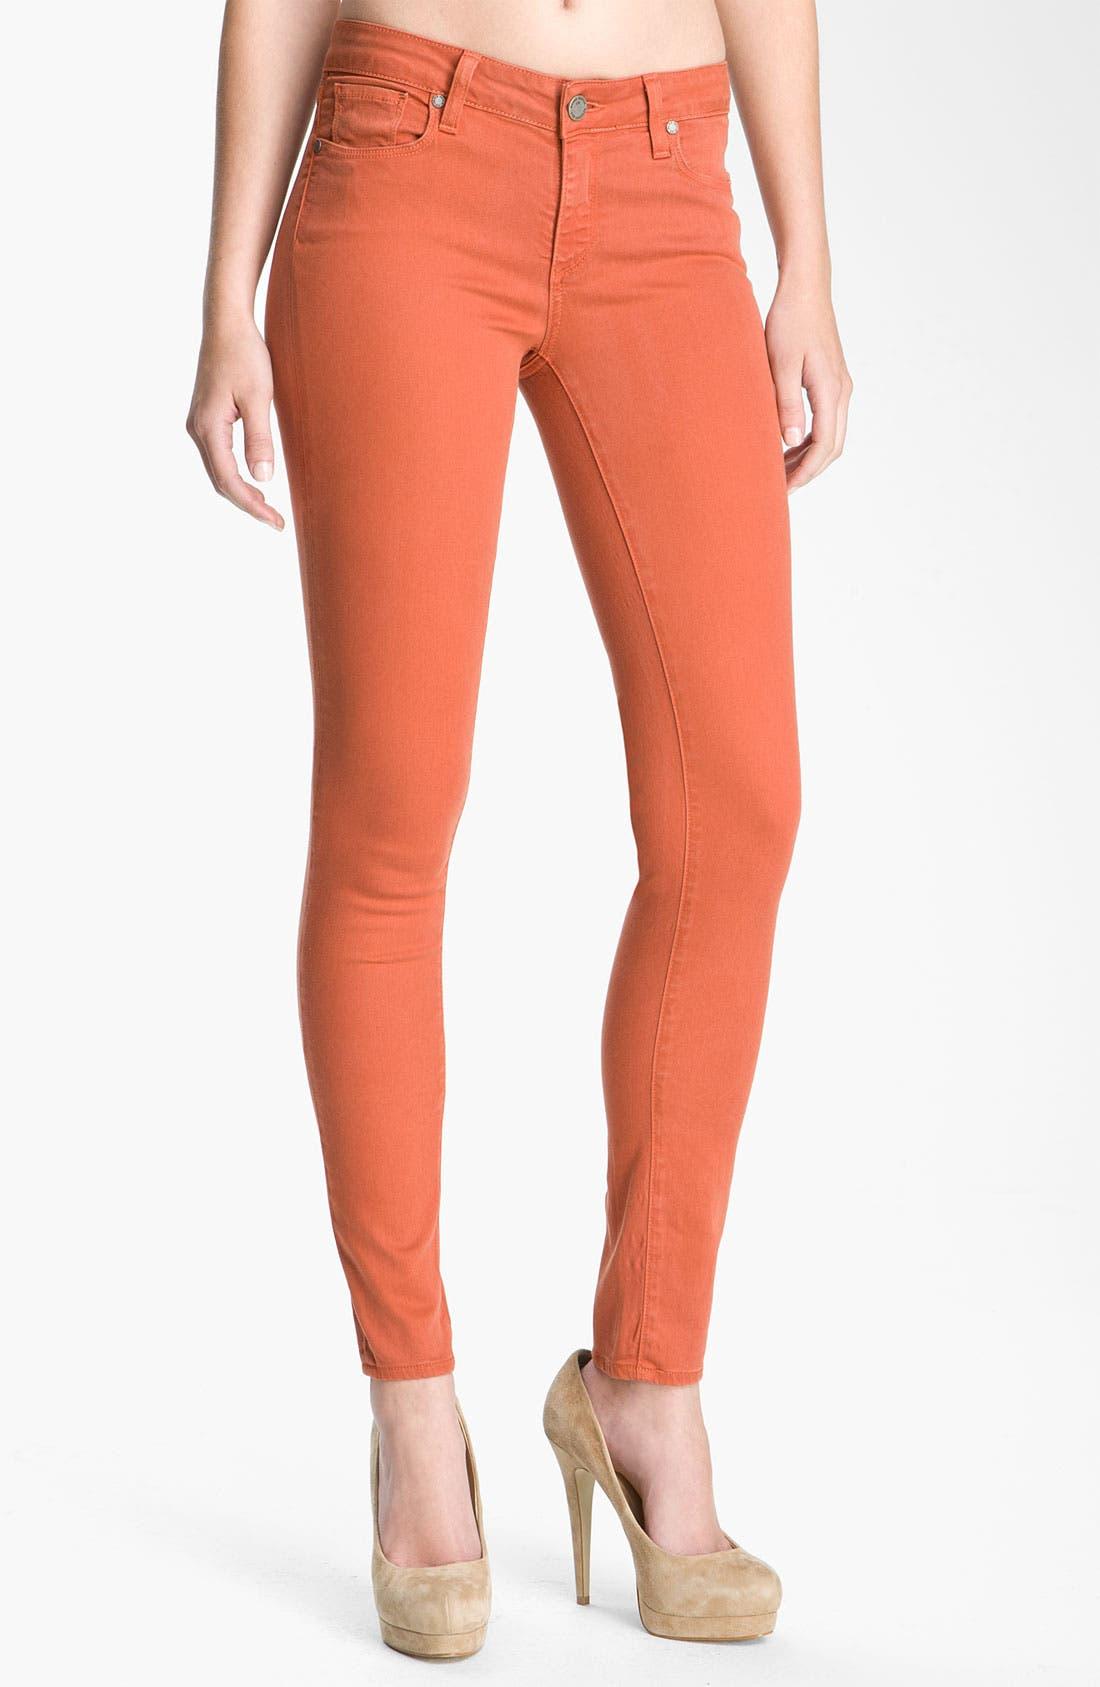 Main Image - Paige Denim 'Verdugo' Skinny Stretch Jeans (Picasso)